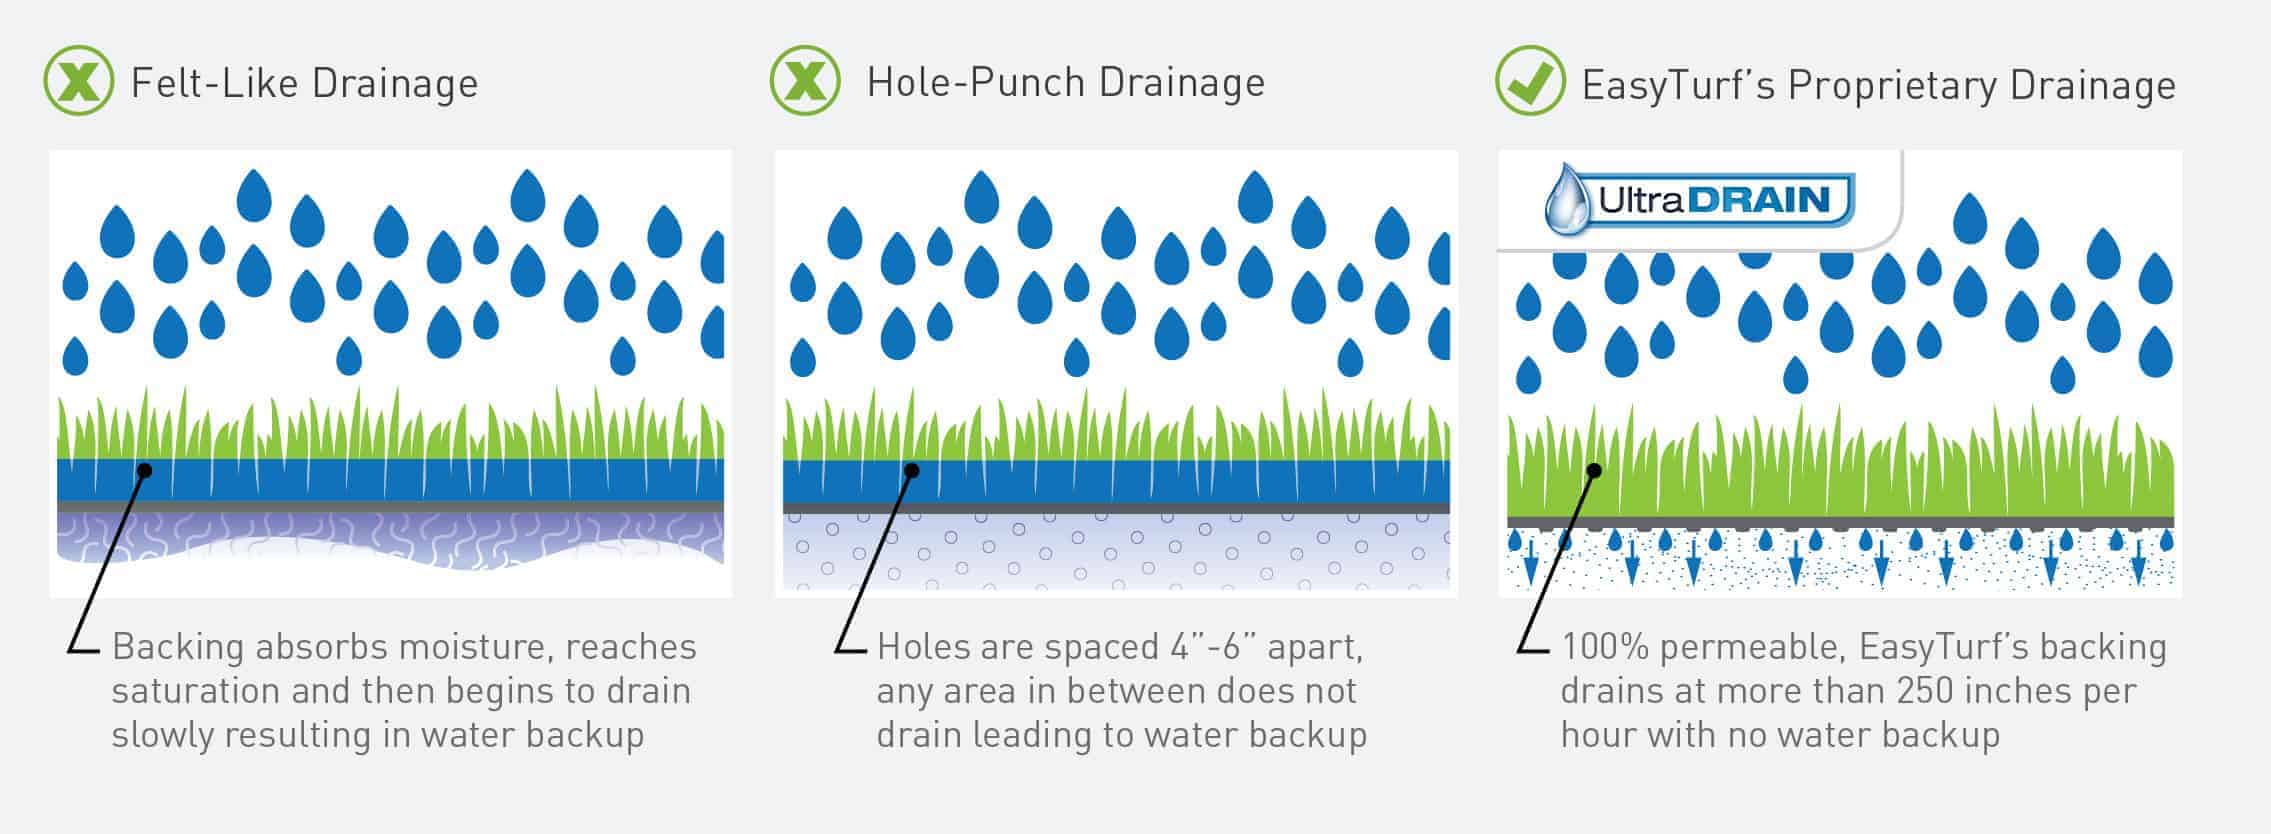 Artificial grass drainage artificial turf products easyturf artificial grass drainage comparison solutioingenieria Choice Image